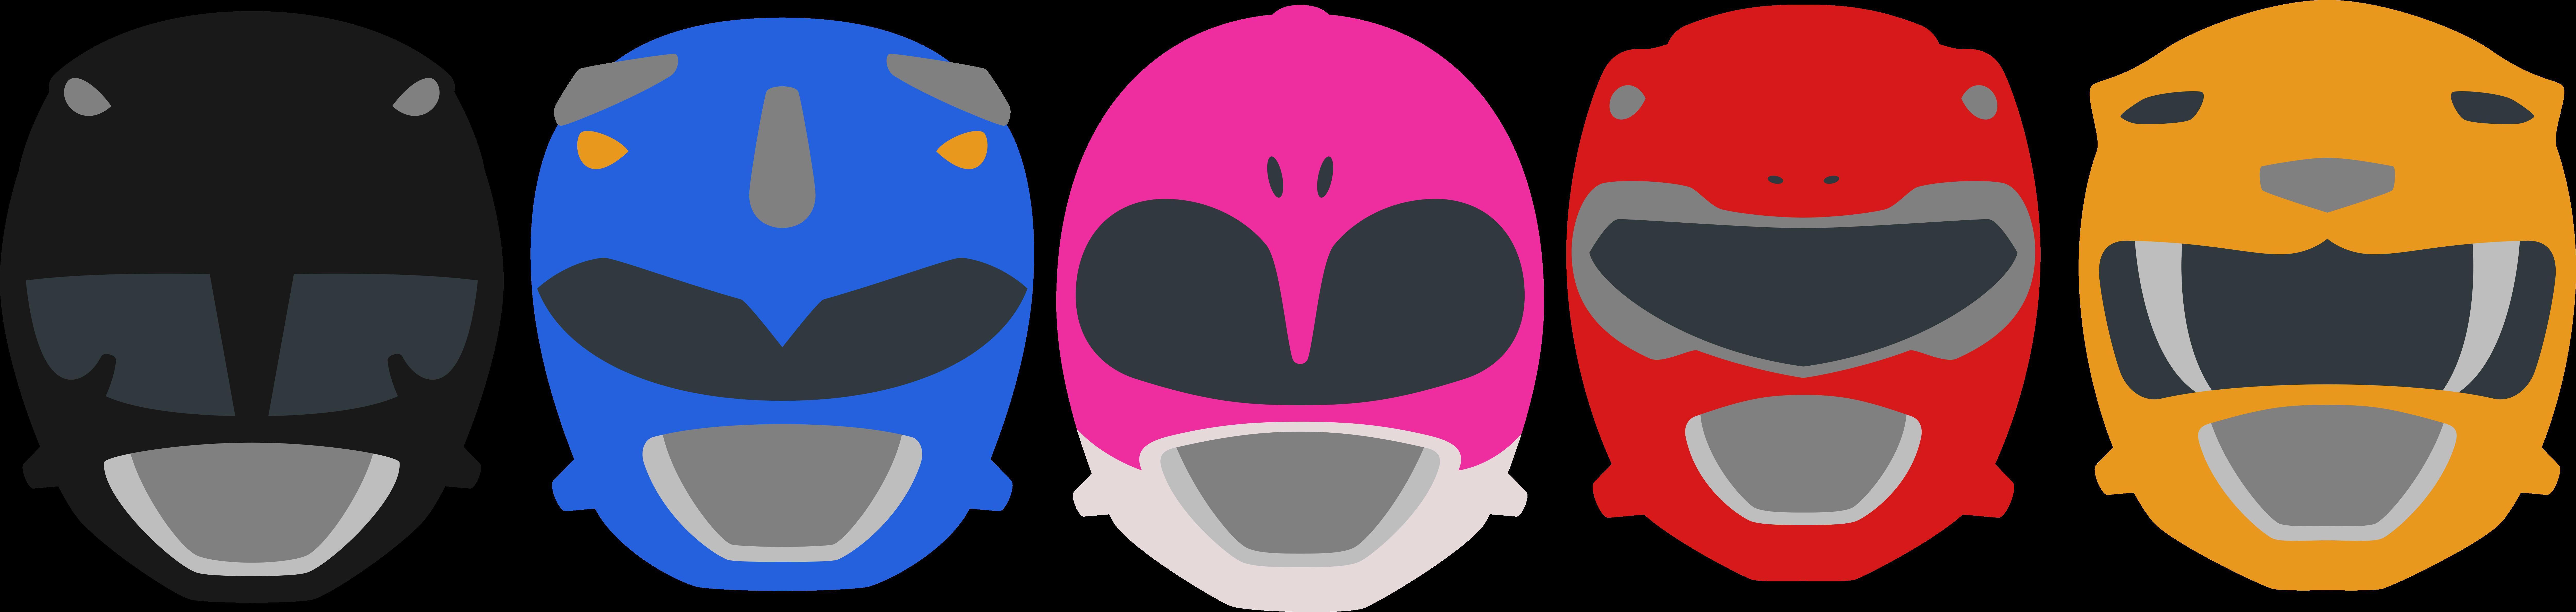 Helmet clipart pink. Super sentai power rangers